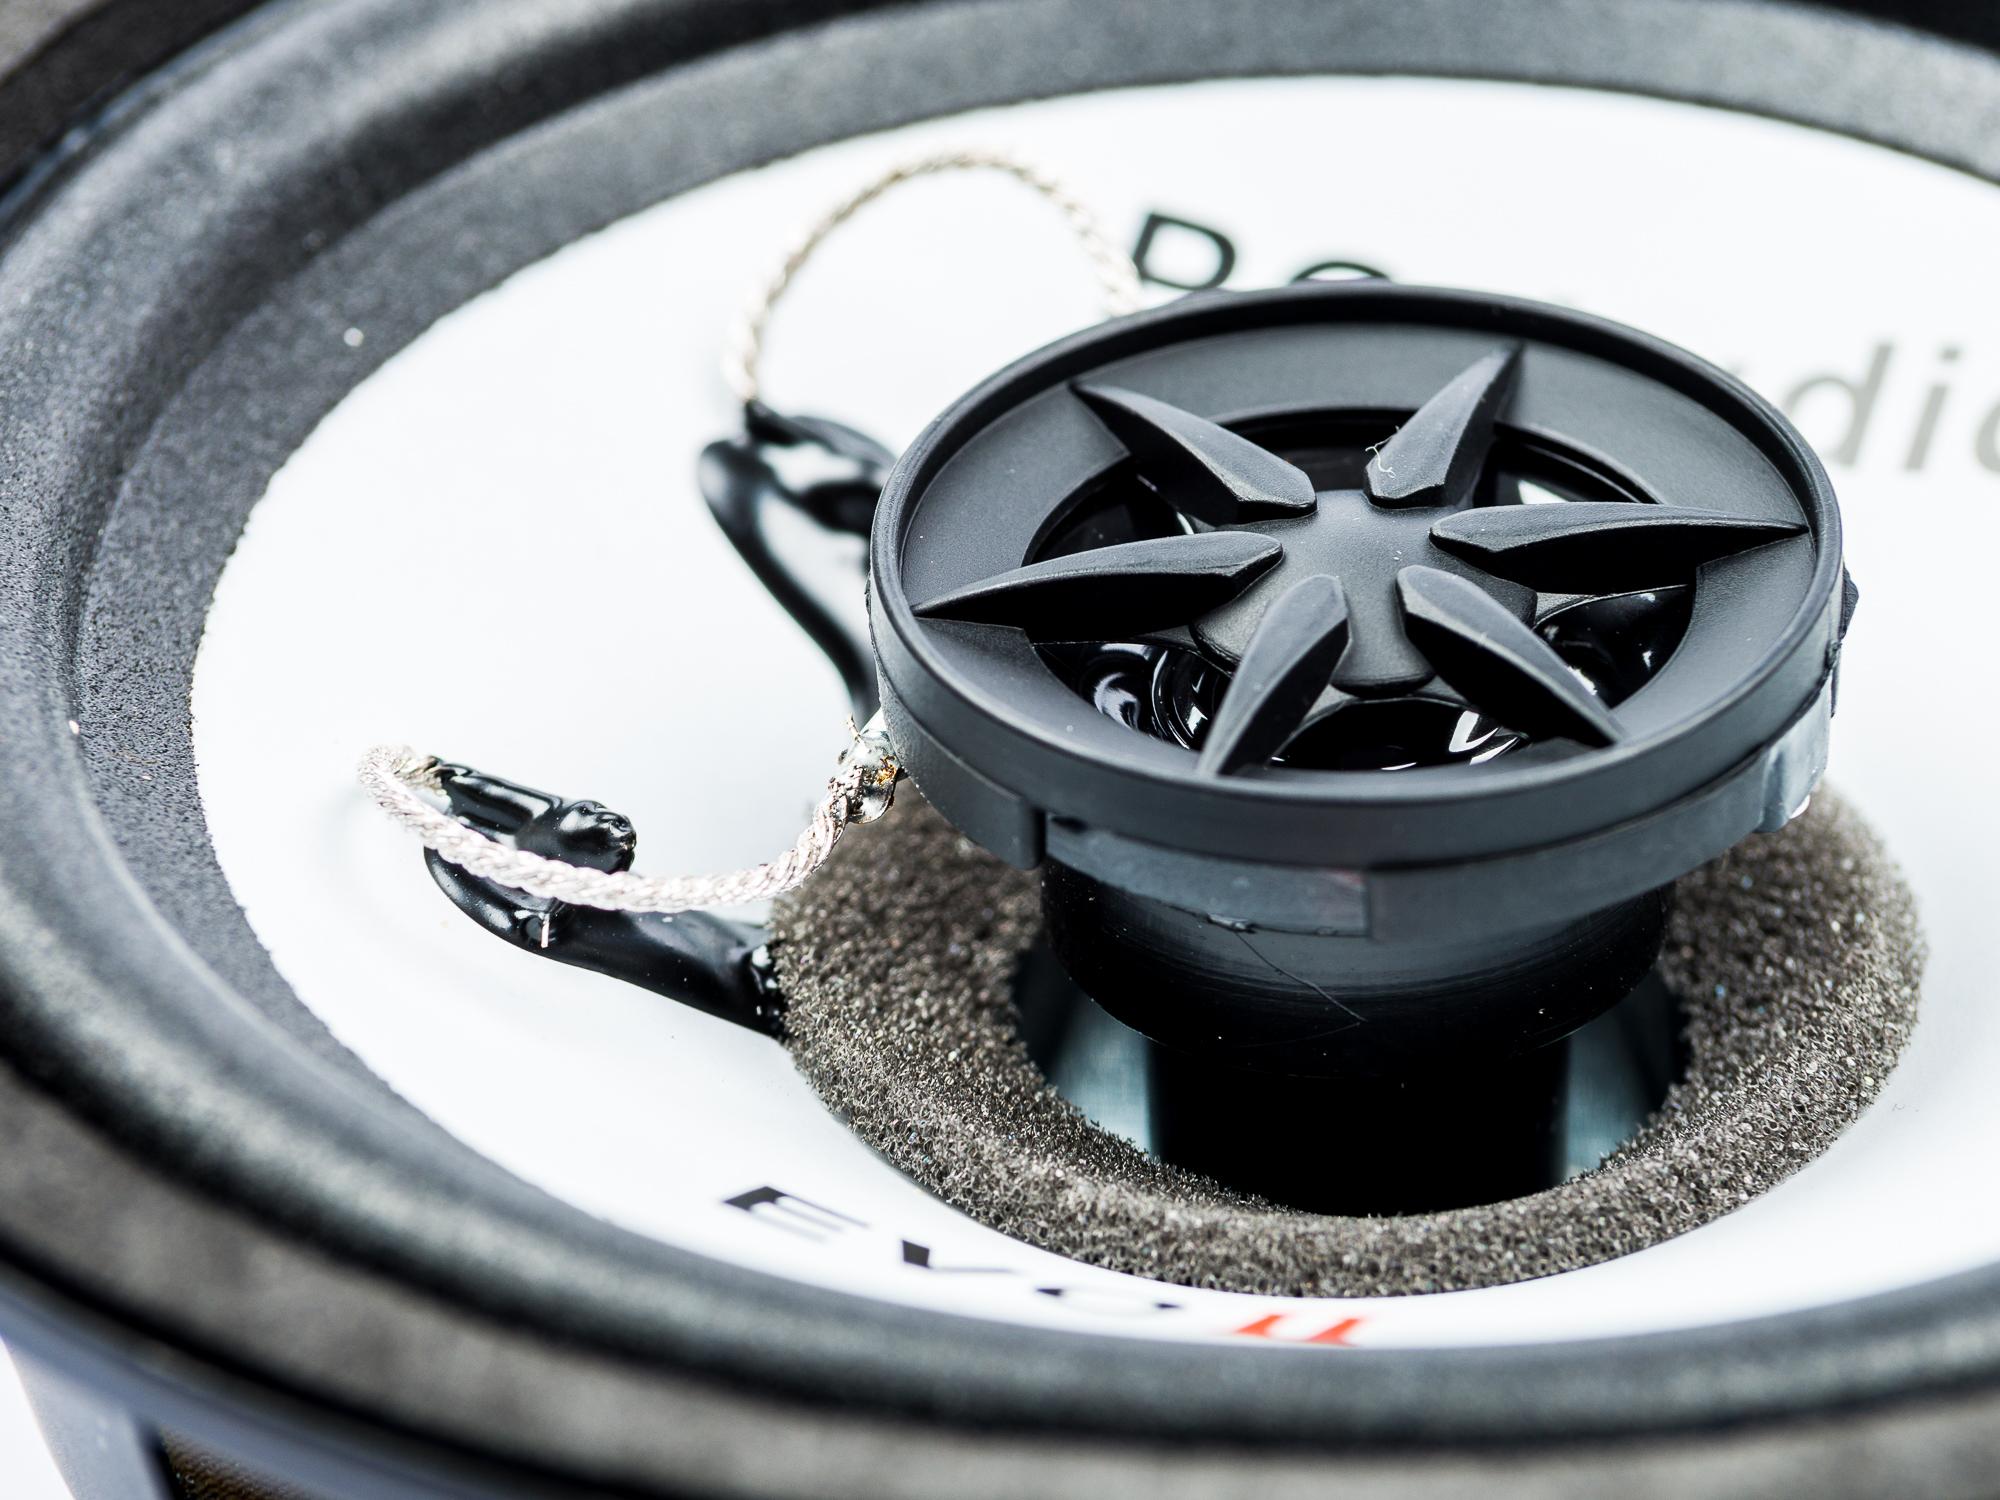 Fiat Sedici Opel Agila B Lautsprecher Einbauset Tür vorne PG Audio – Bild 4